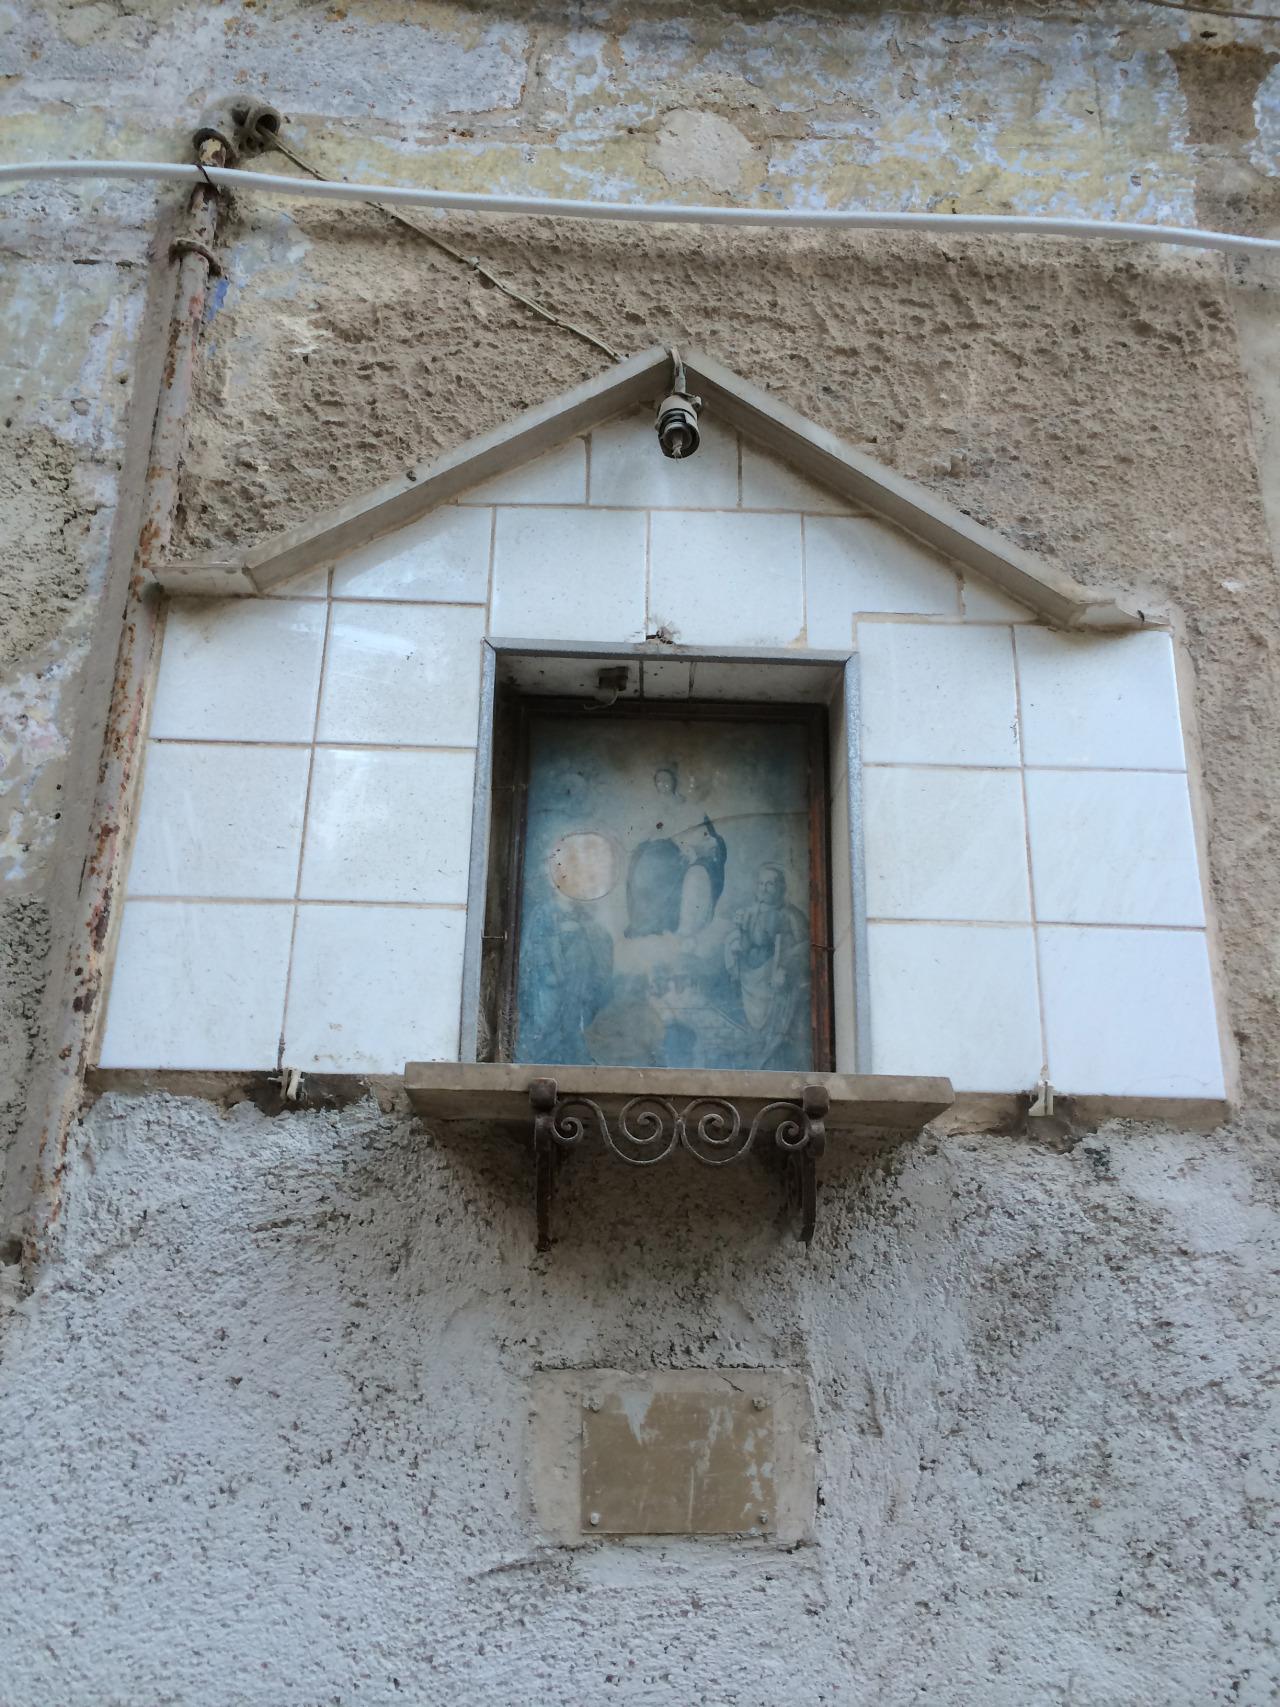 http://blog.tamvodopad.com/tumblr_files/tumblr_mr5a7z4BED1qmwcxto1_500.jpg